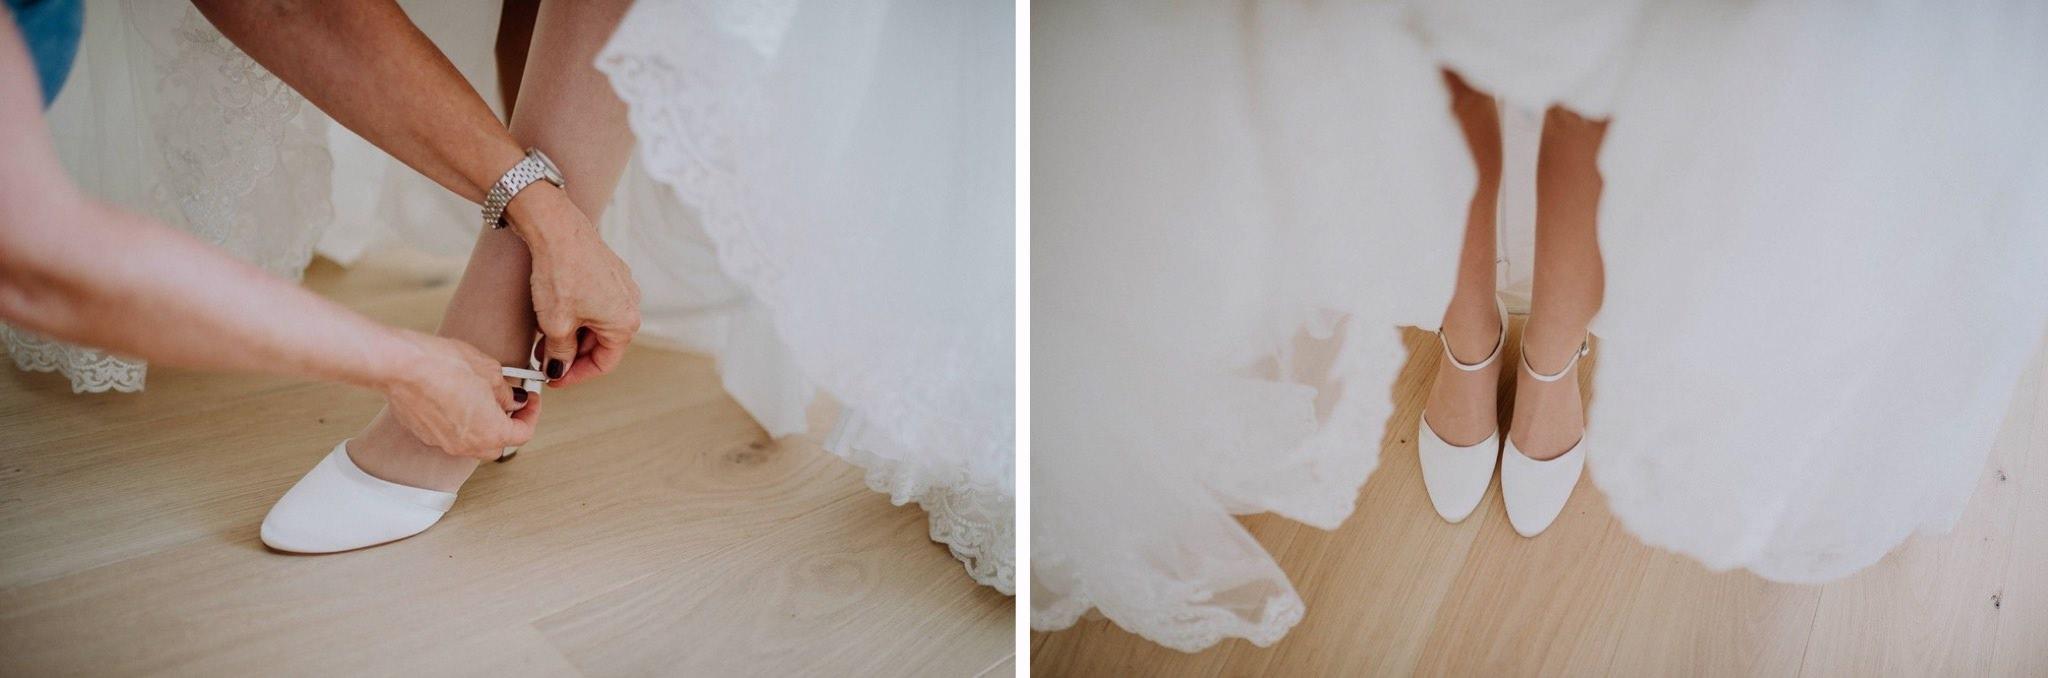 wedding photographer hamilton new zealand 1003 2